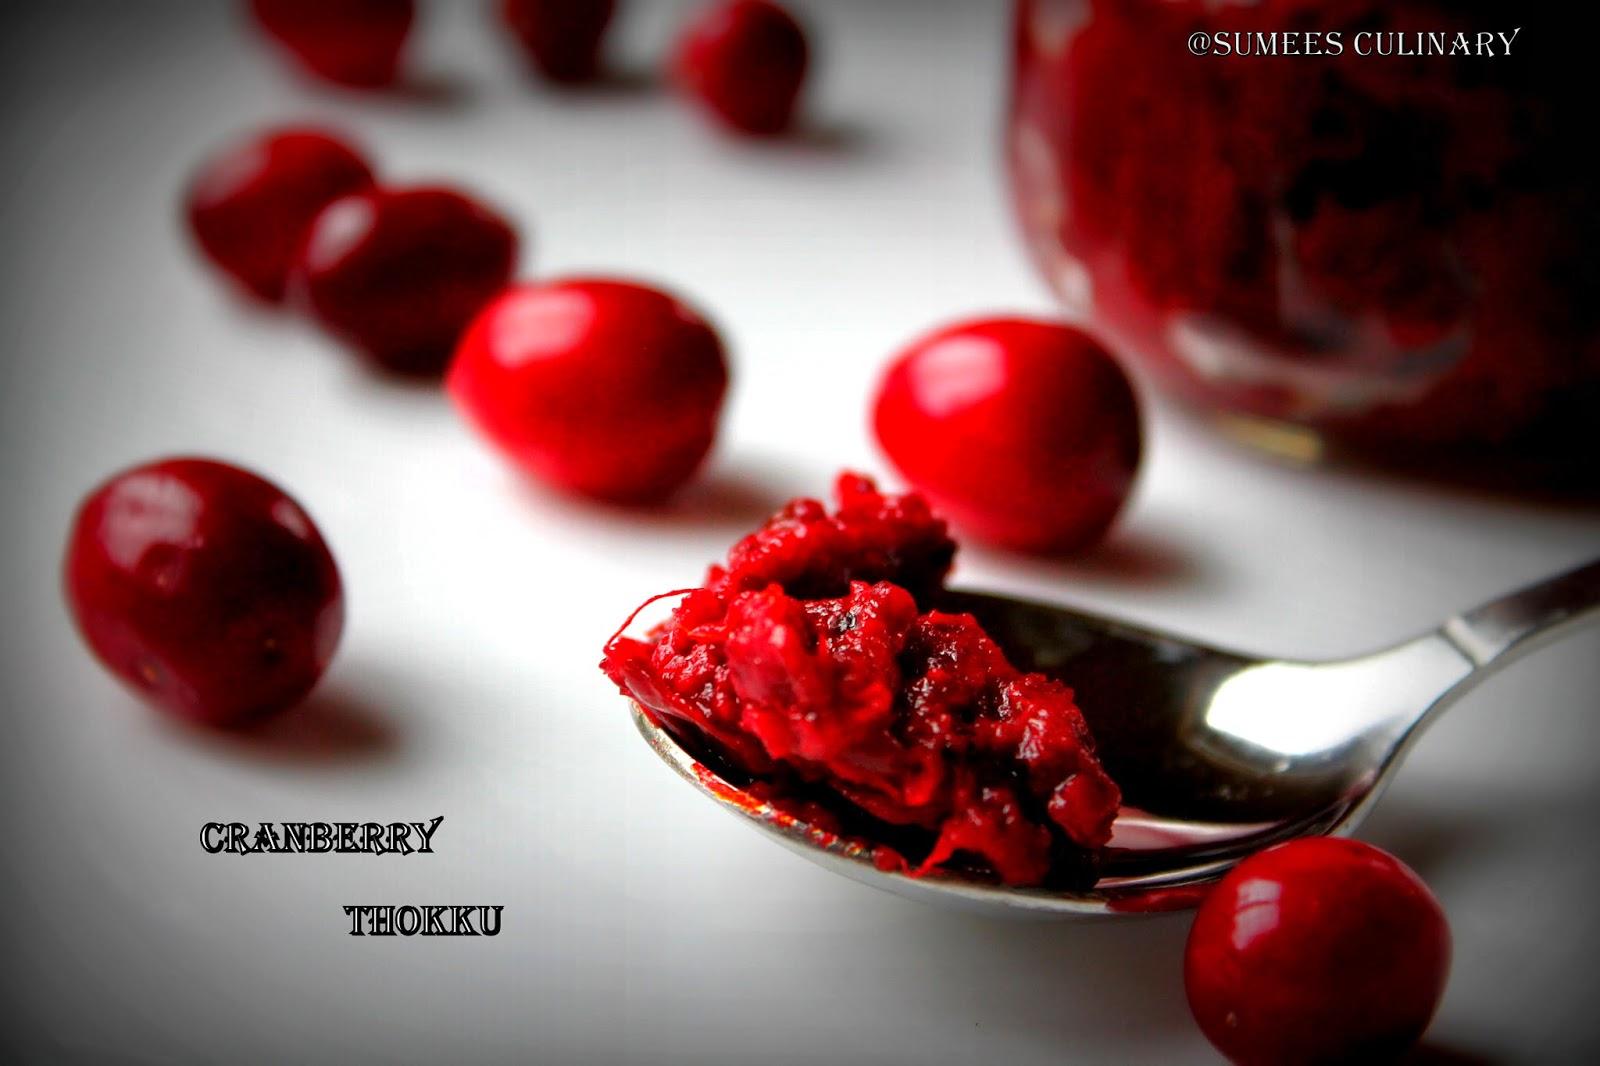 cranberry thokku/ spicy cranberry relish